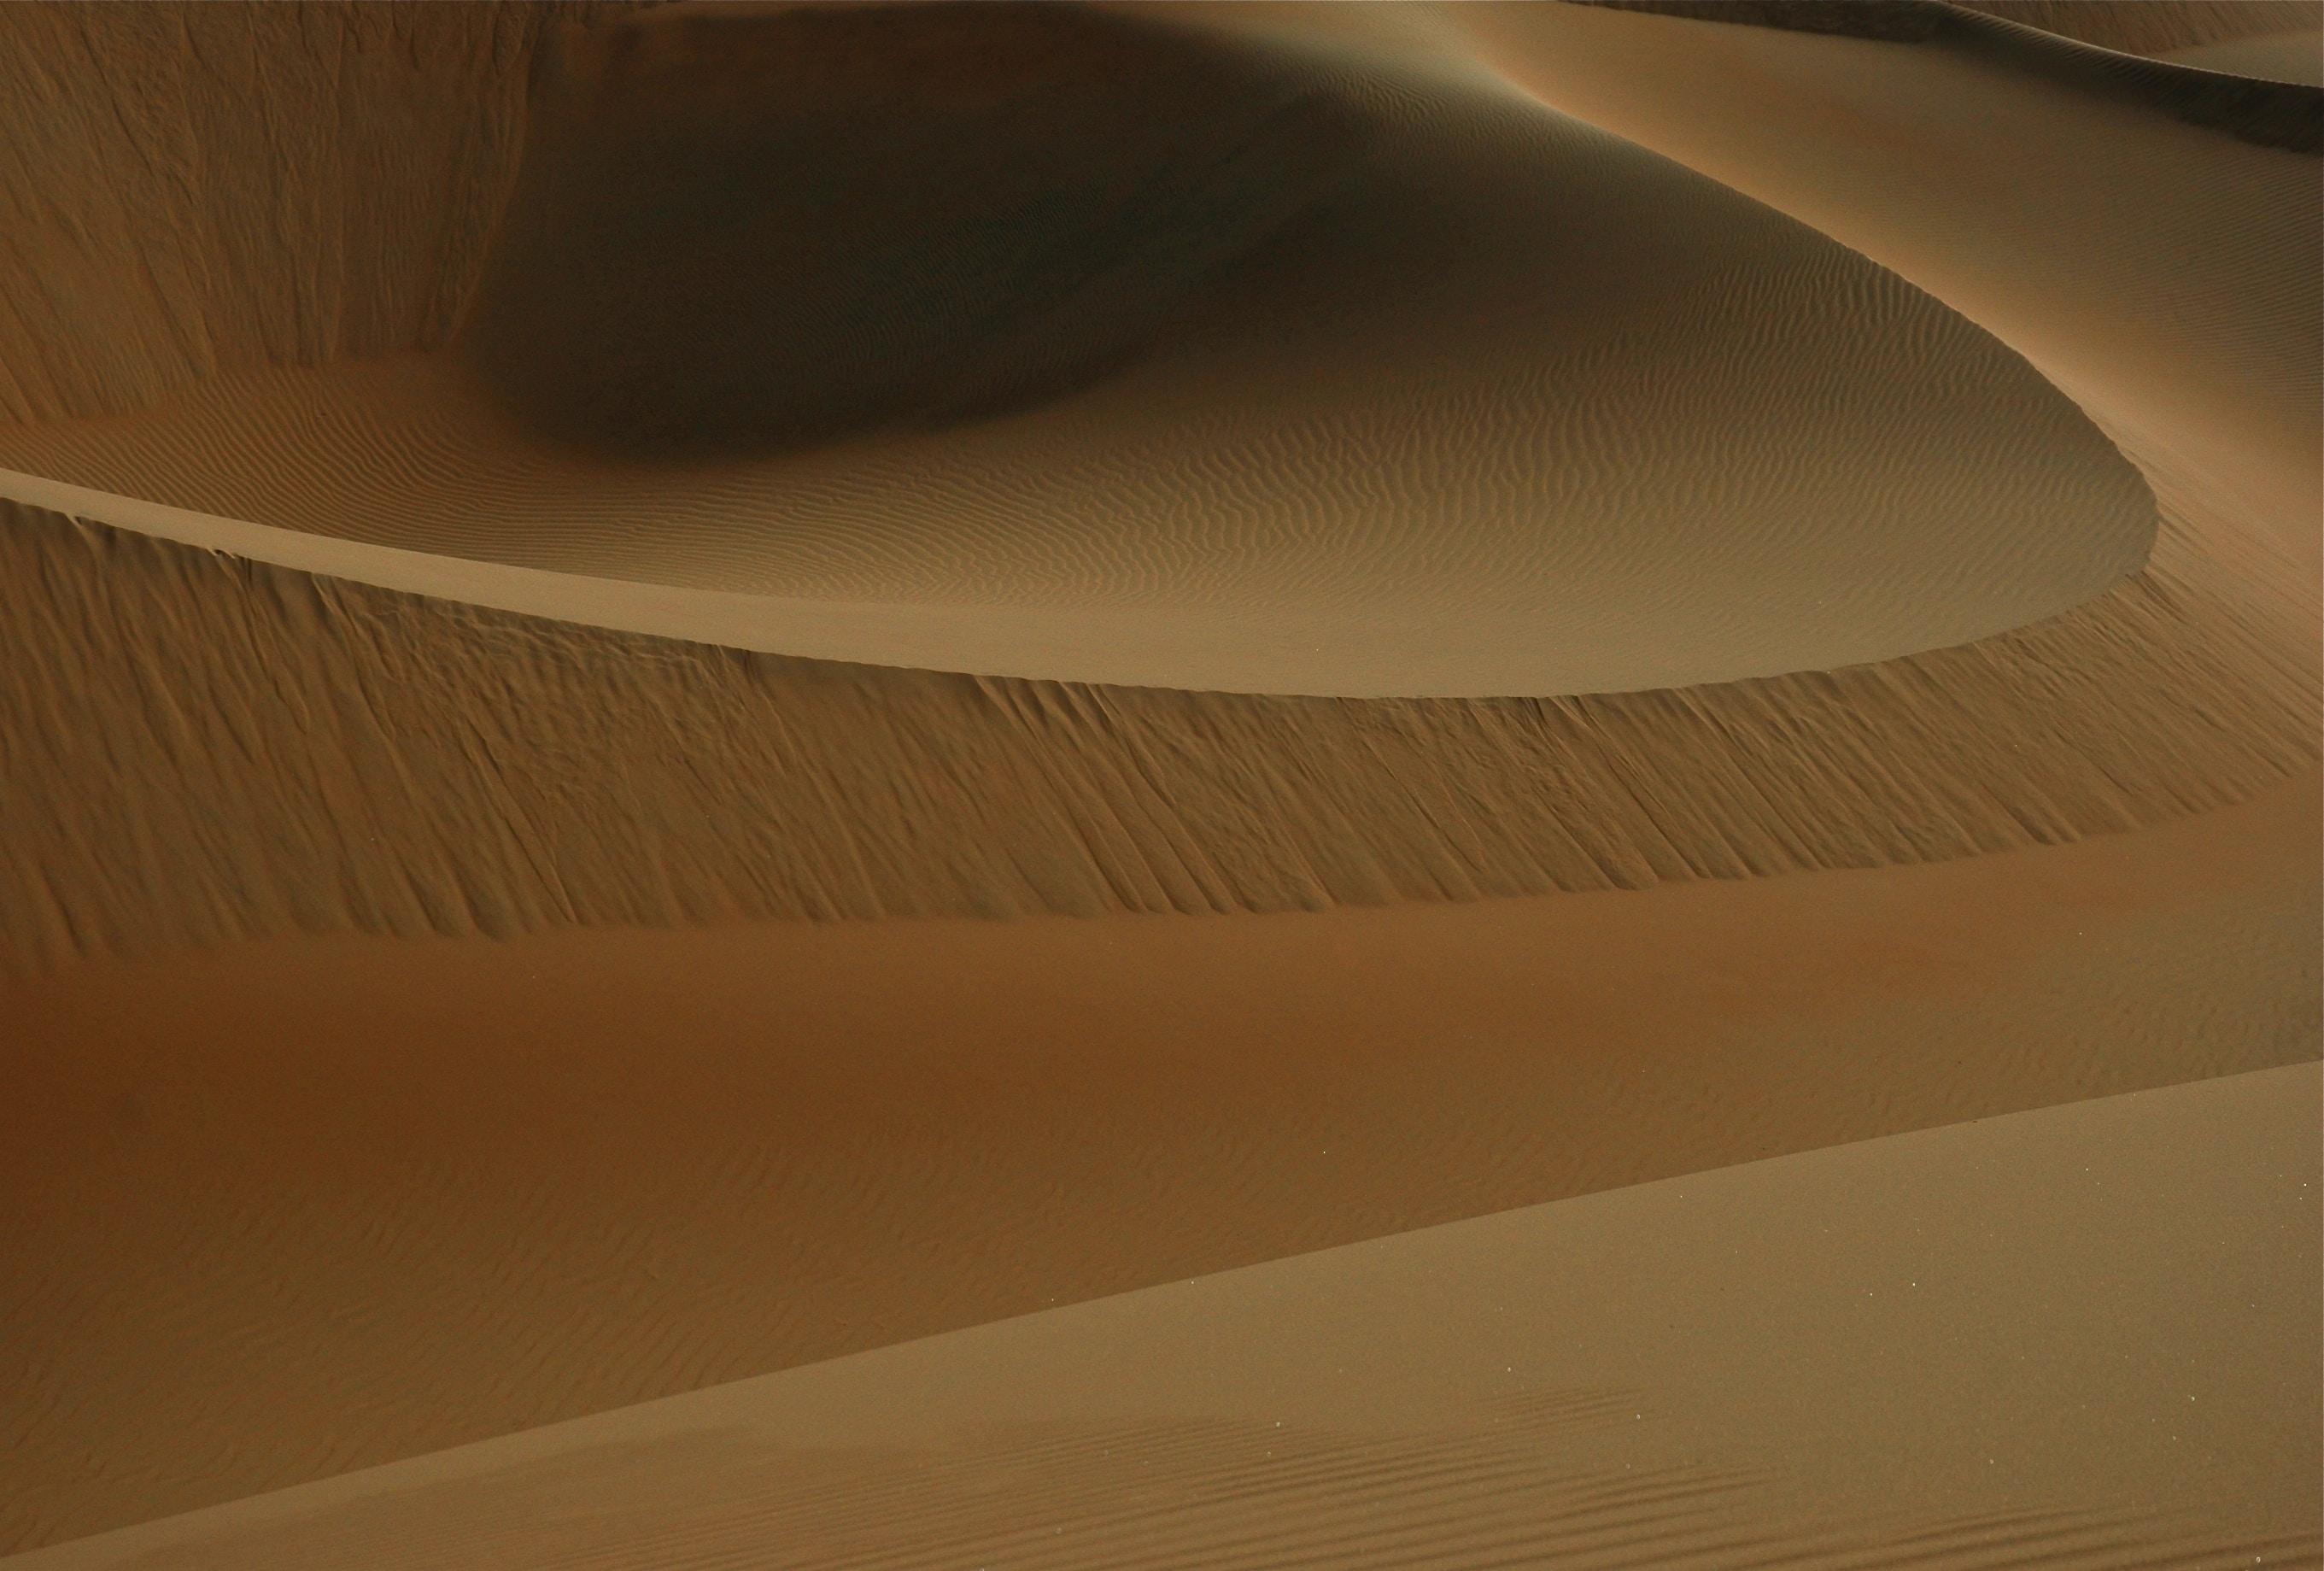 Artistic sand dunes in the desert of United Arab Emirates